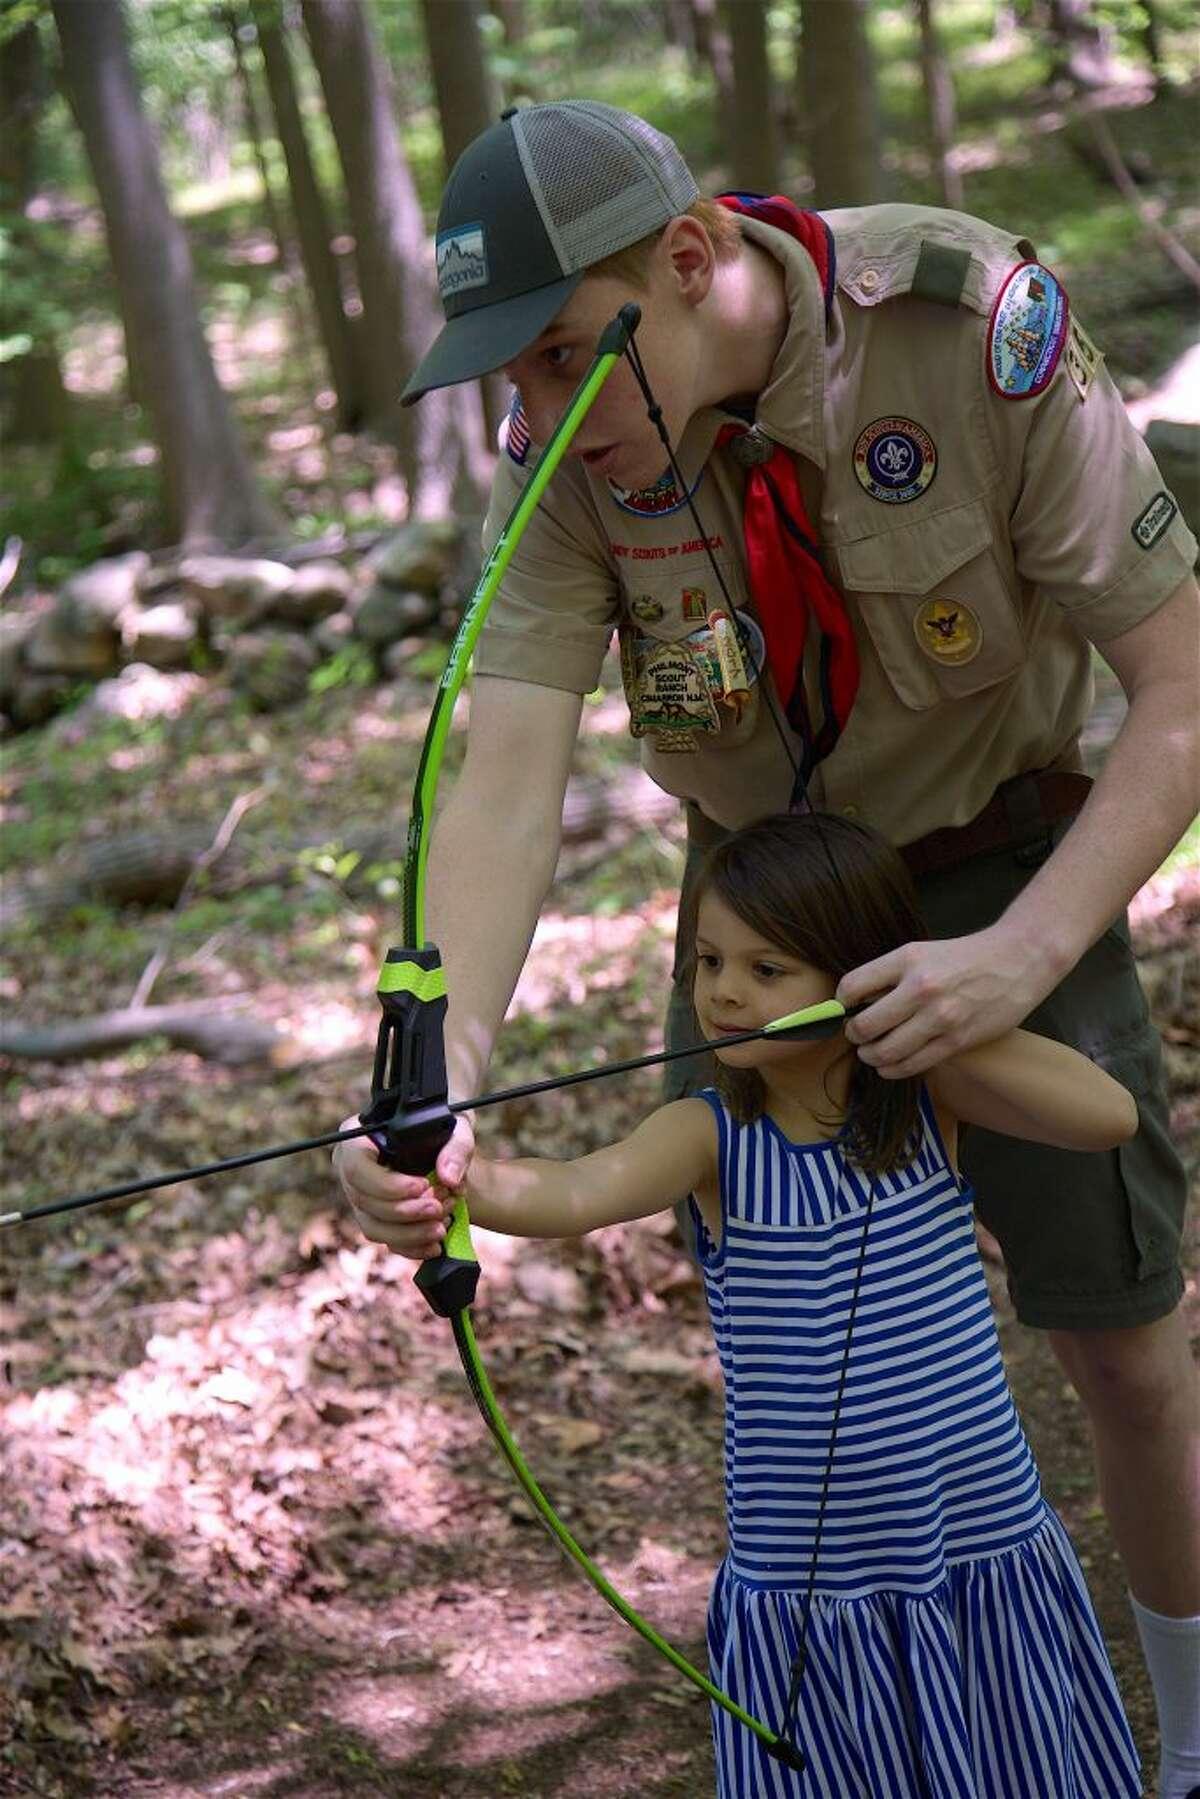 Boy Scout Frank Pirone, 15, of Darien, introduces Maren Papajohn, 4, of Darien, to archery.